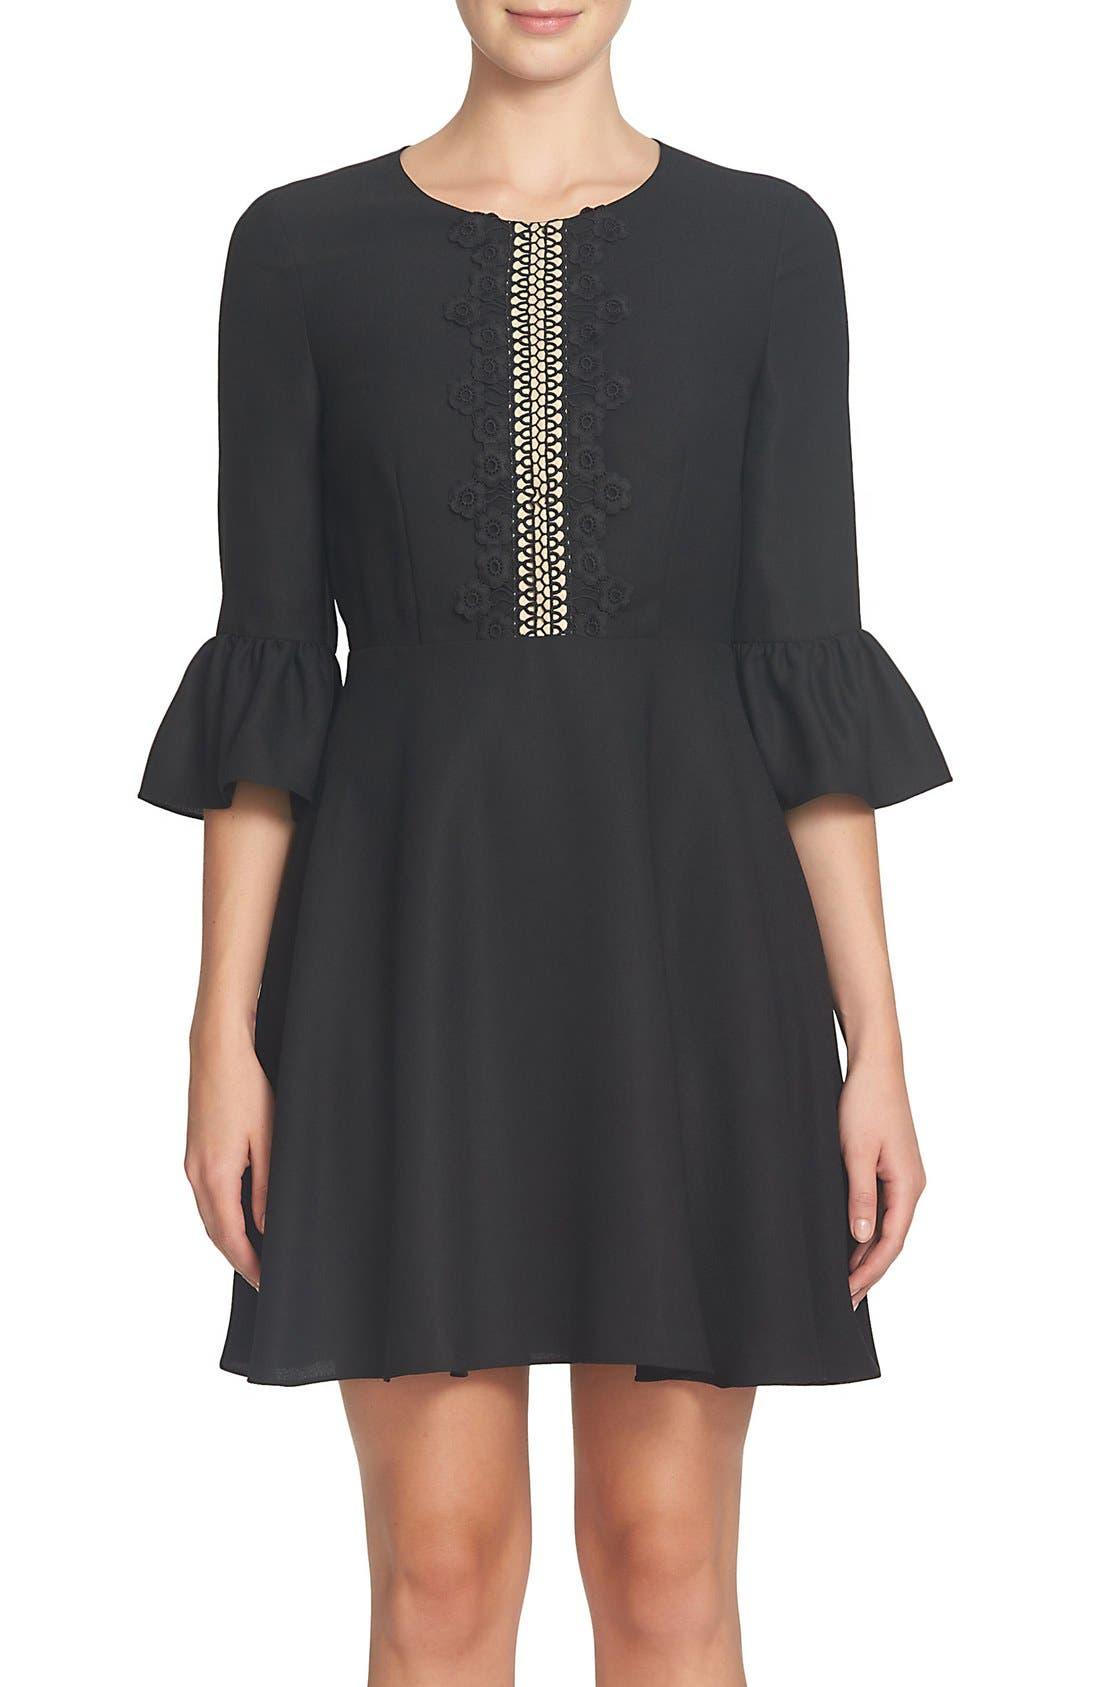 Alternate Image 1 Selected - CeCe Laine Fit & Flare Dress (Regular & Petite)